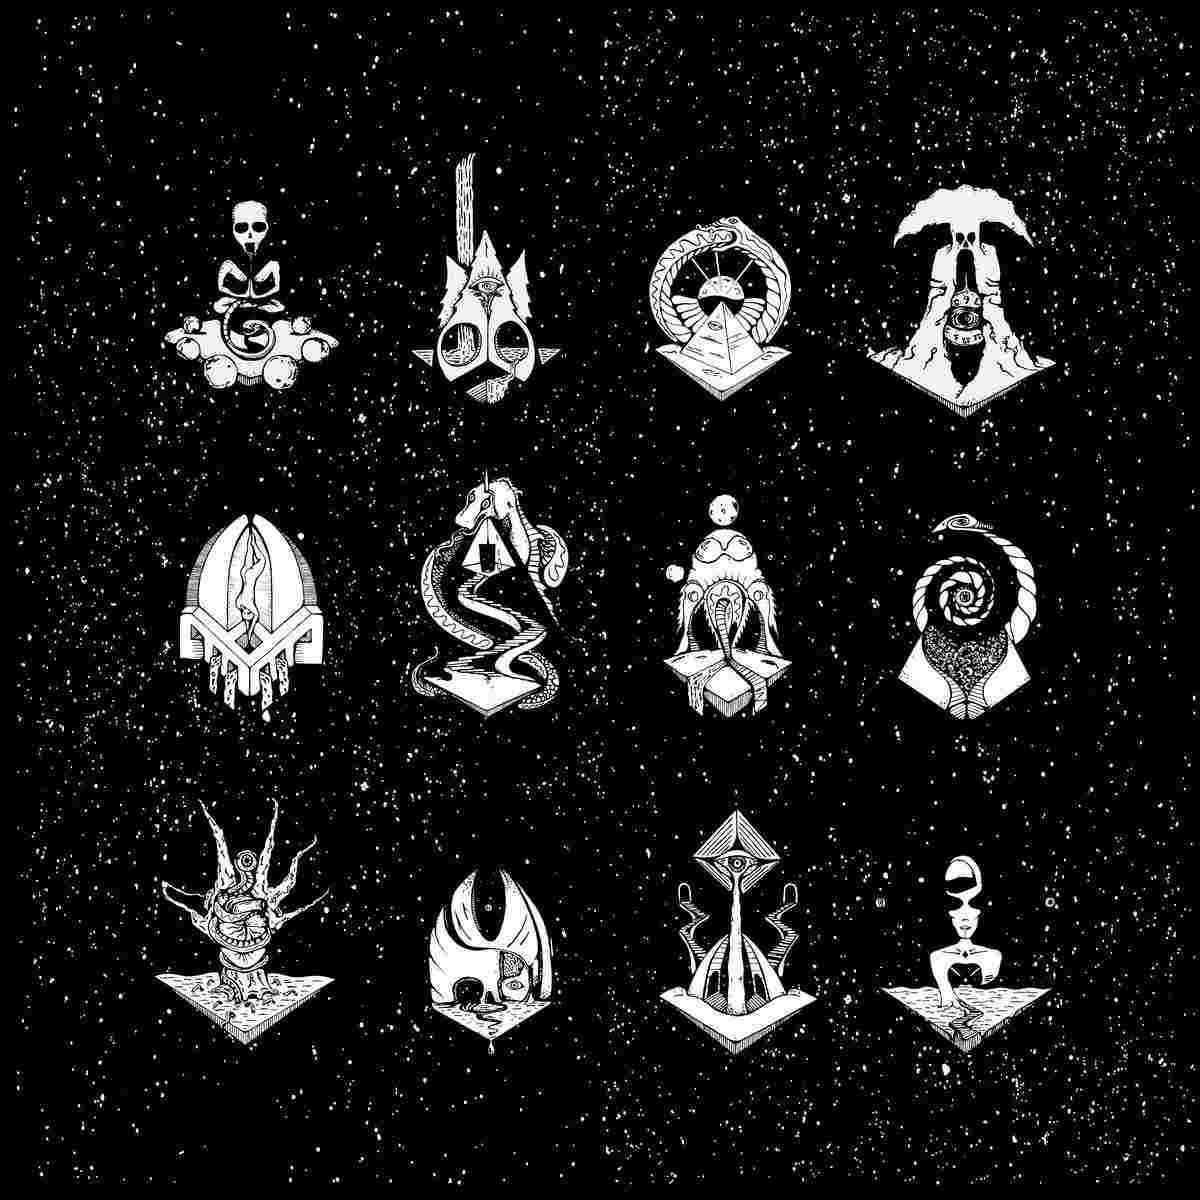 Savage Moods - Dark Matter album cover